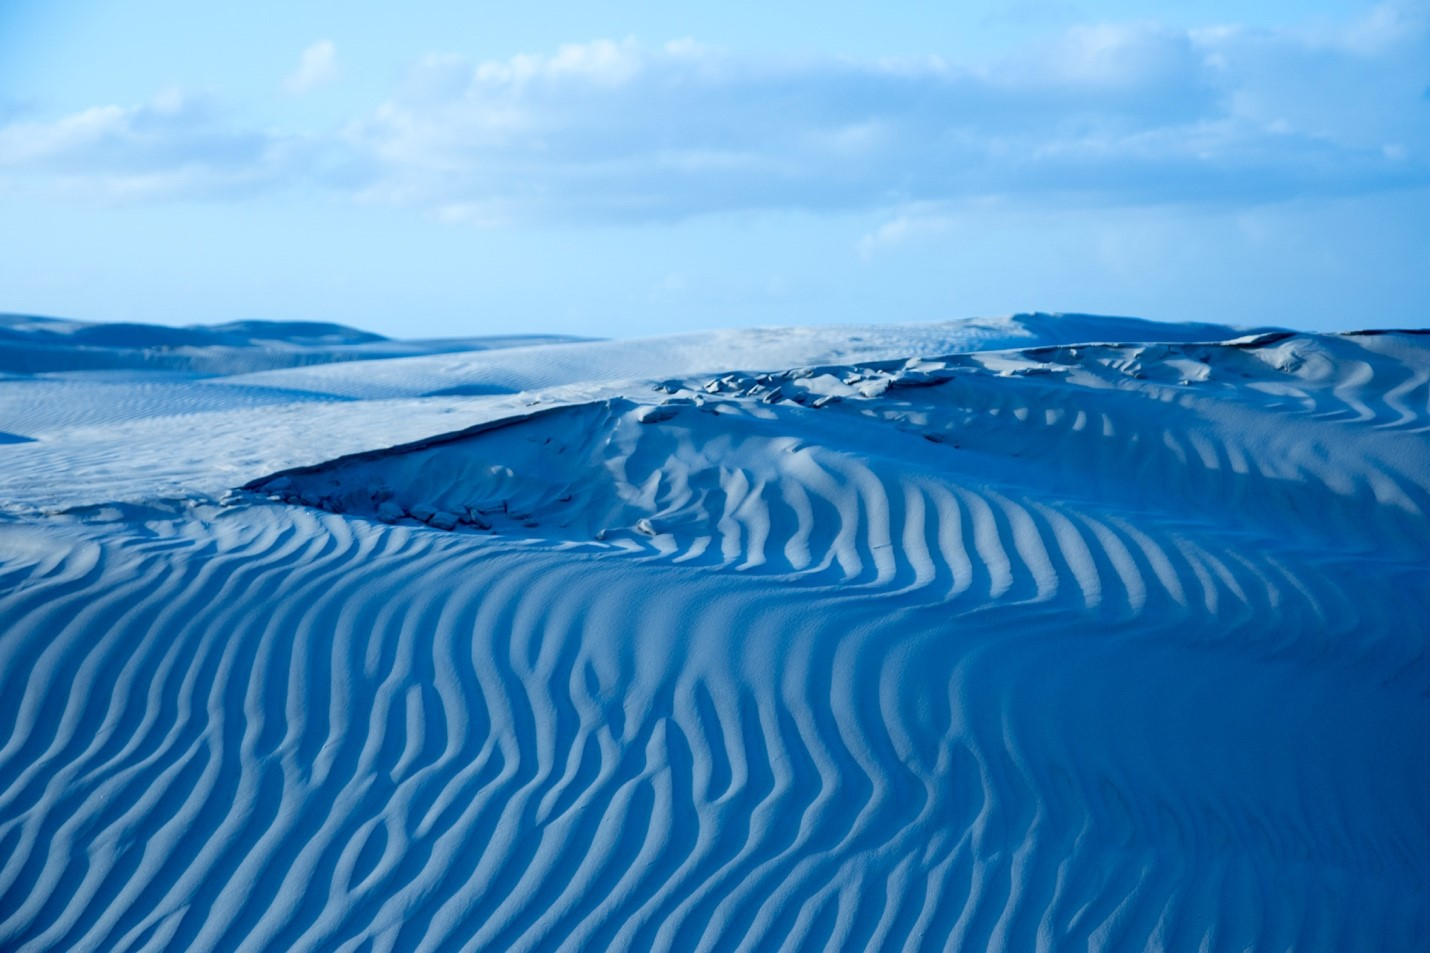 cool blue colors of dunes in baja